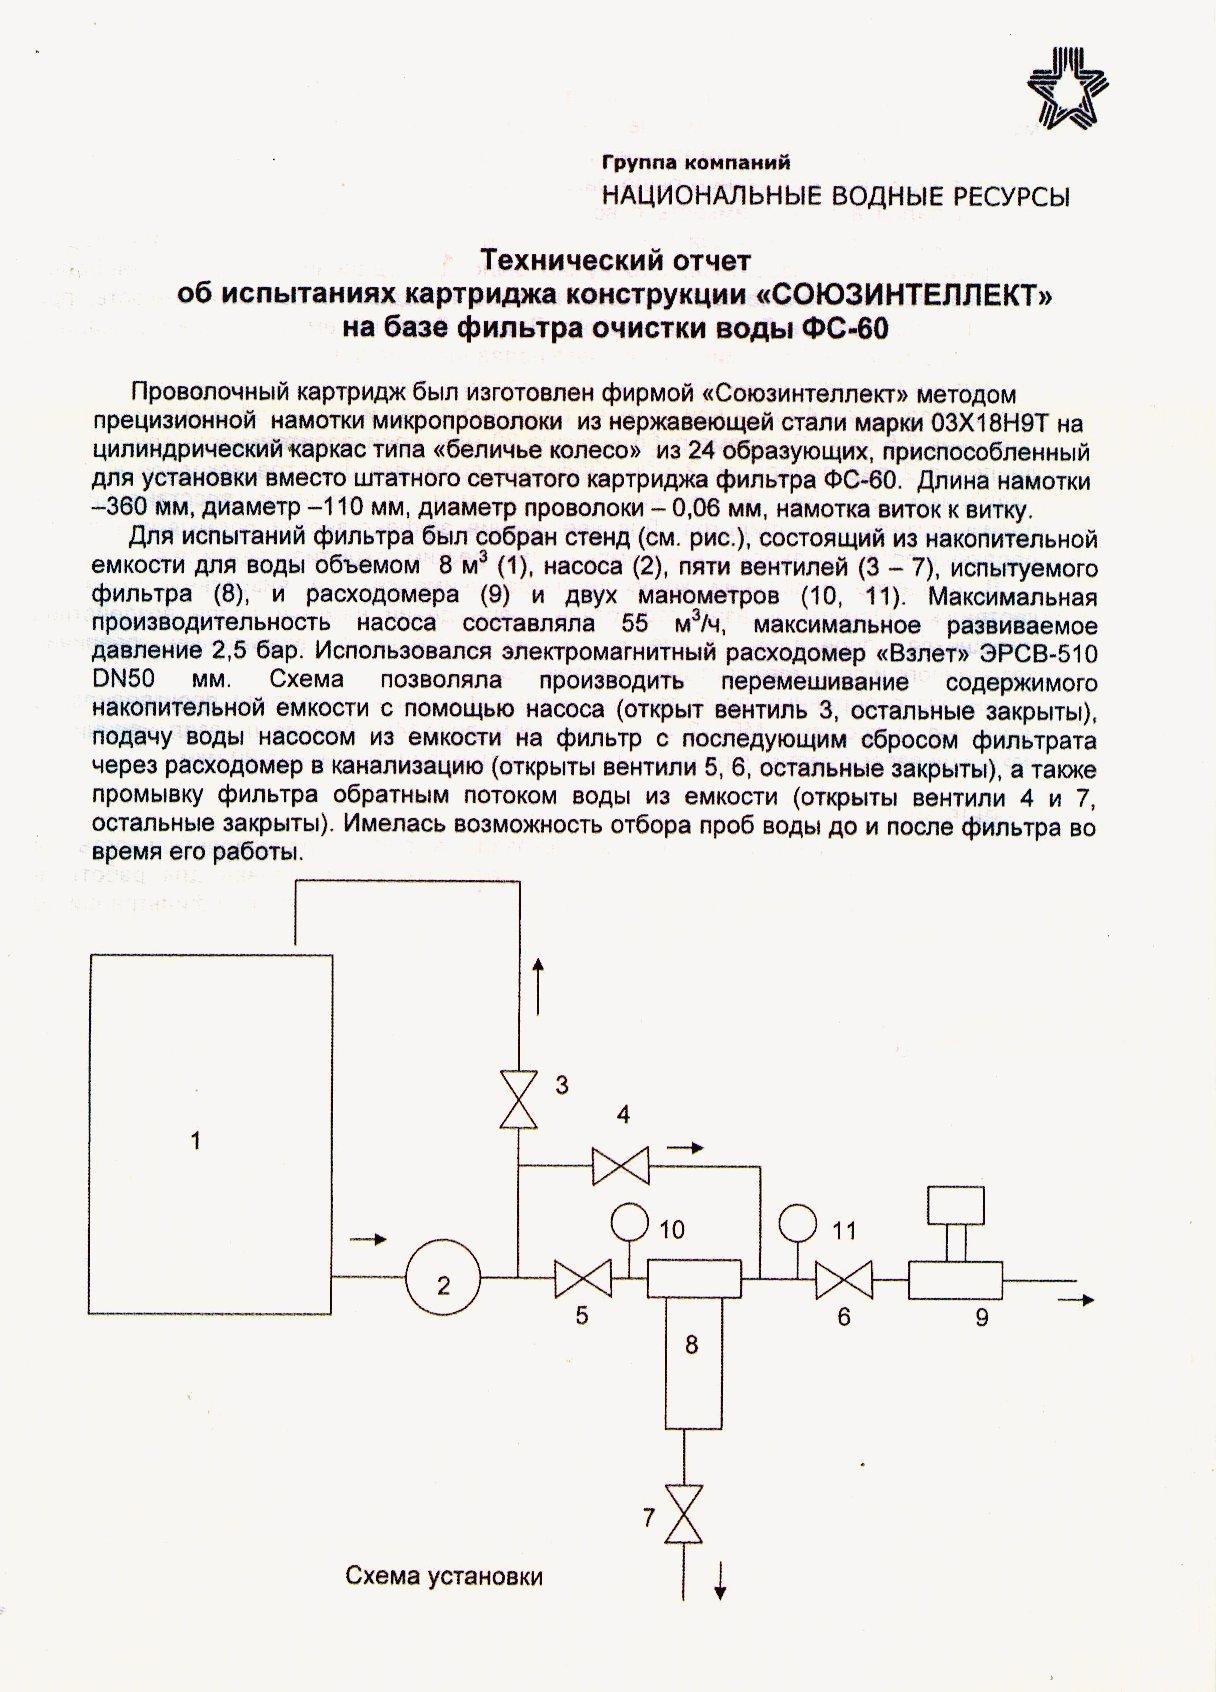 http://souzintellekt.ru/images/upload/fs60-1.jpg